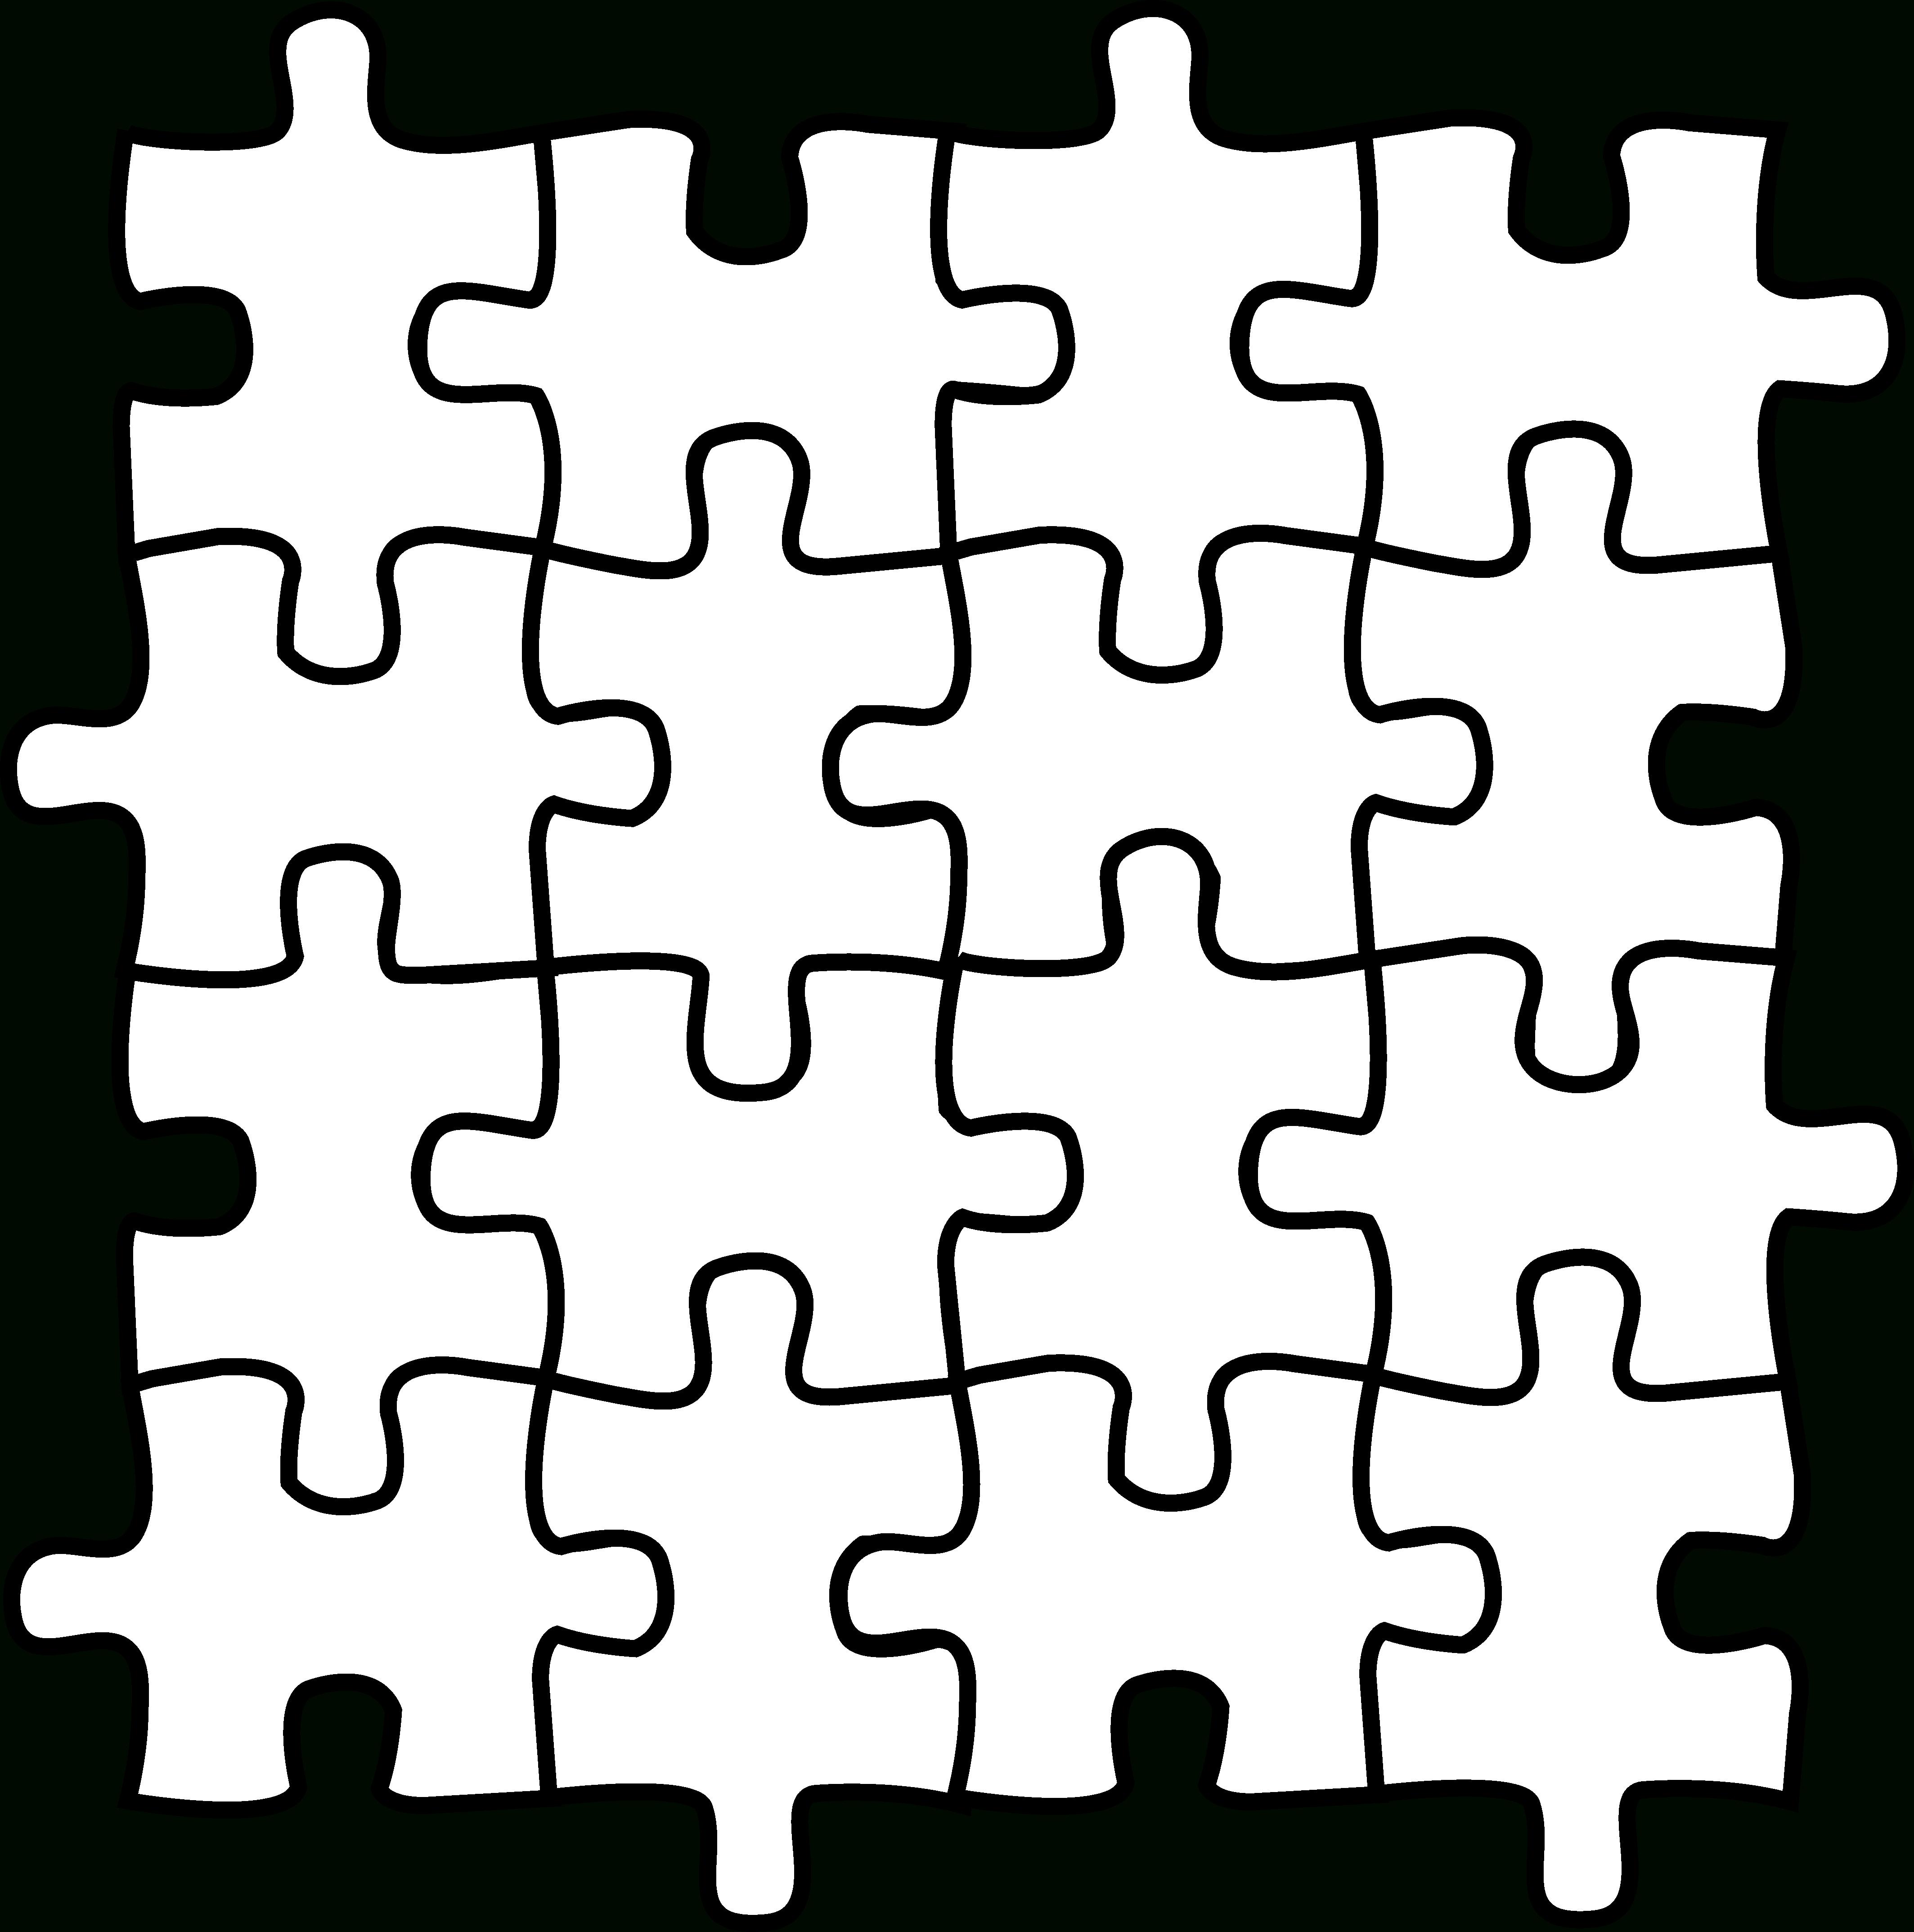 5 Puzzle Pieces | Free Download Best 5 Puzzle Pieces On Clipartmag - 5 Piece Printable Puzzle